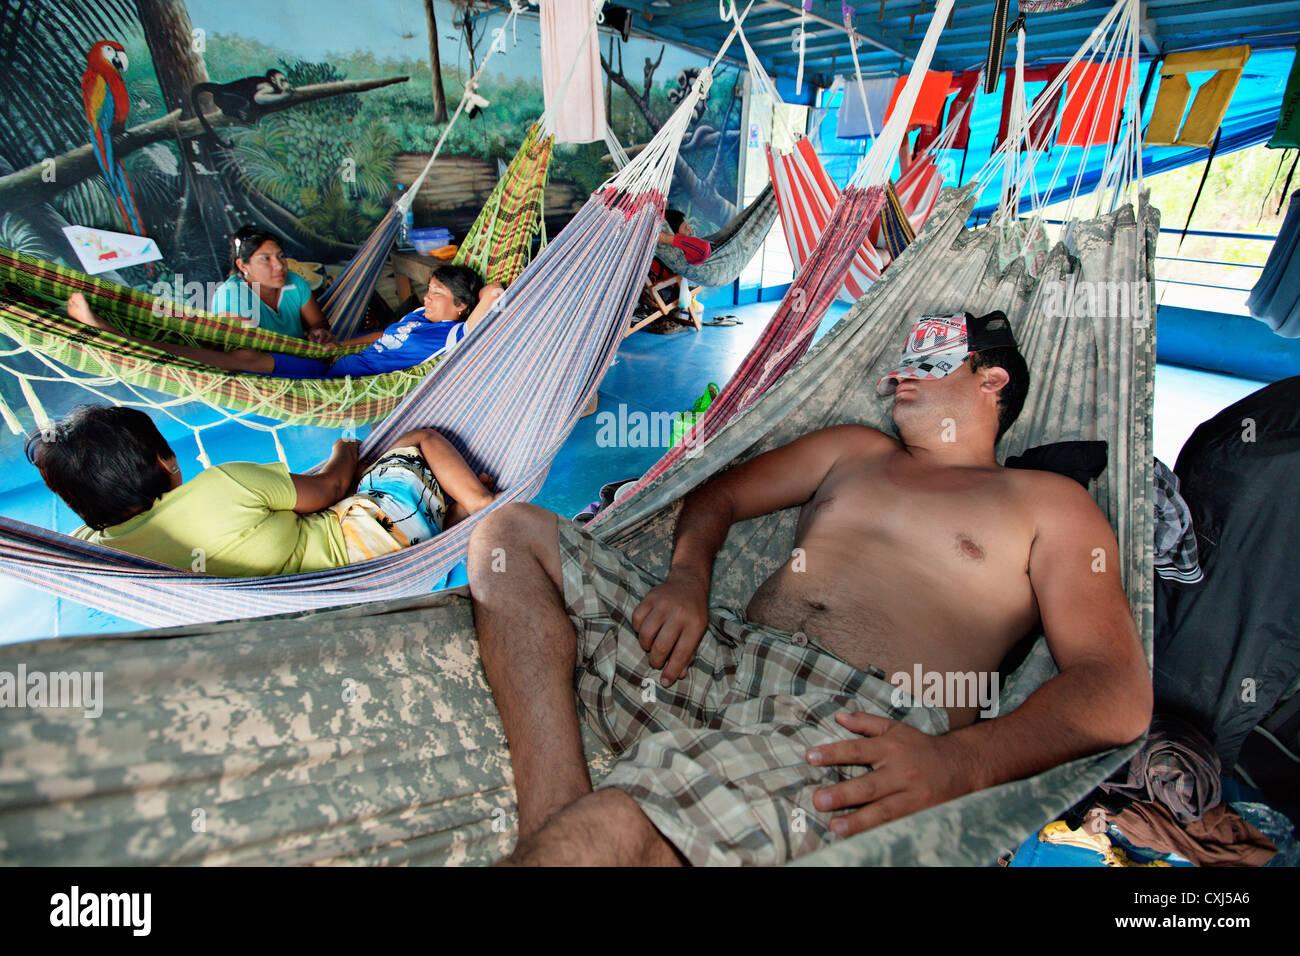 passangers sleep in hammocks in a river boat on amazon river peru passangers sleep in hammocks in a river boat on amazon river peru      rh   alamy